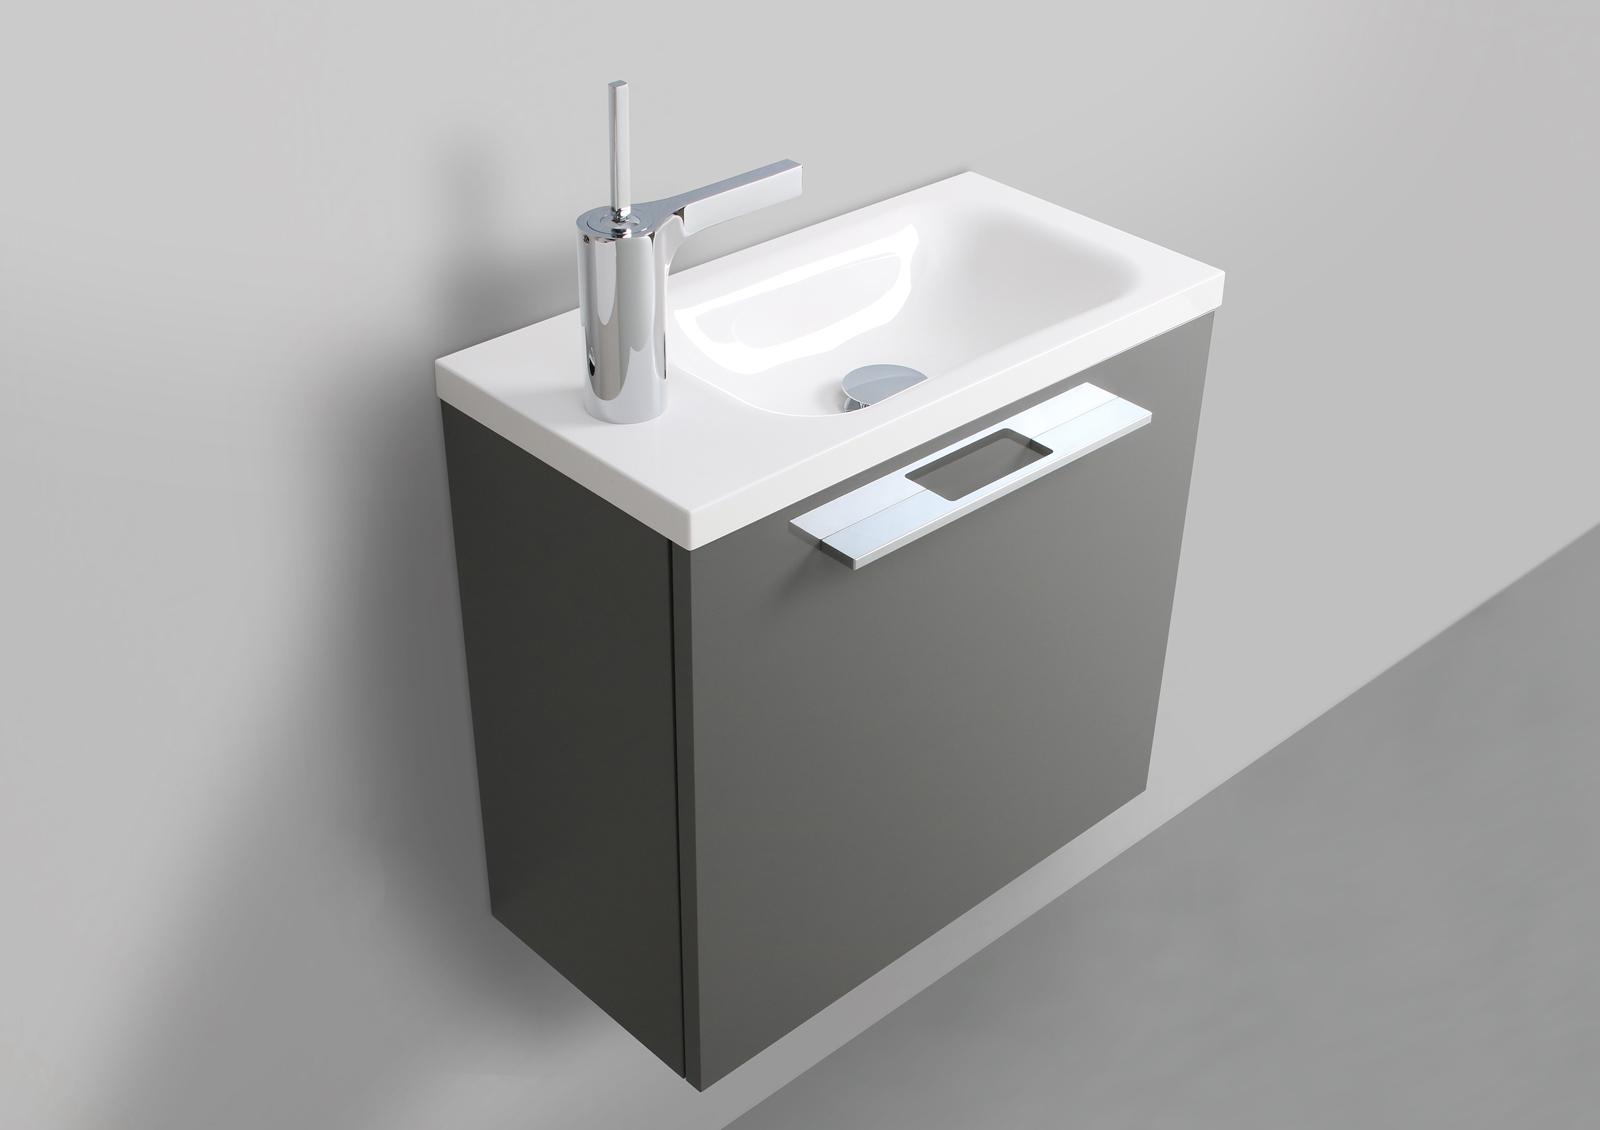 Intarbad Rimini Gaste Badmobel Waschbecken 500x250mm Designbaeder Com